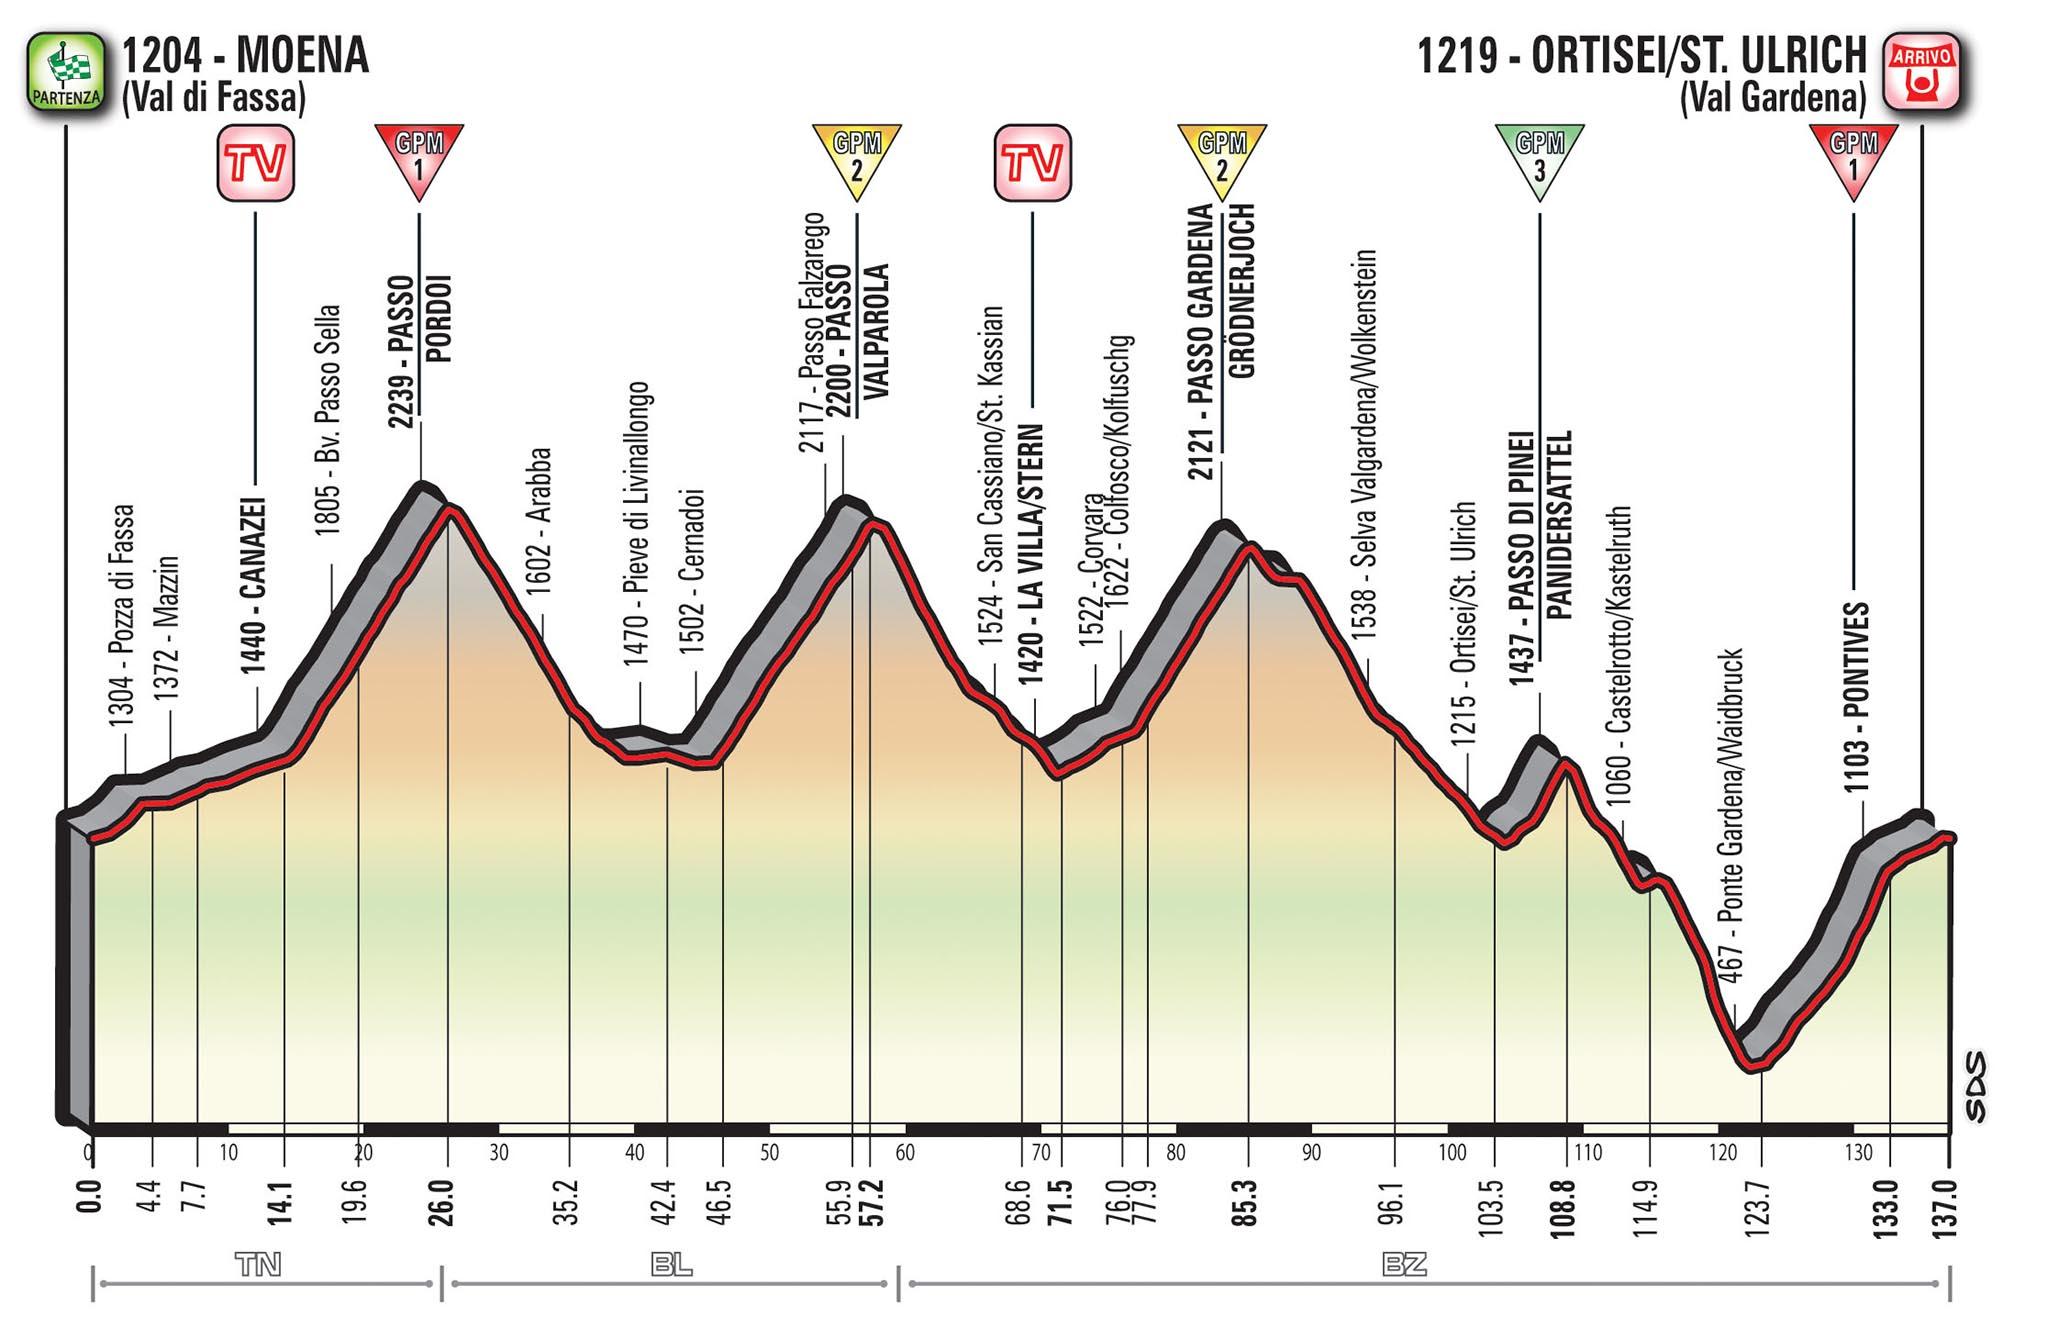 Giro d'Italia 2017: 18° Tappa Moena (Val di Fassa) Ortisei/St. Ulrich (Val Gardena)